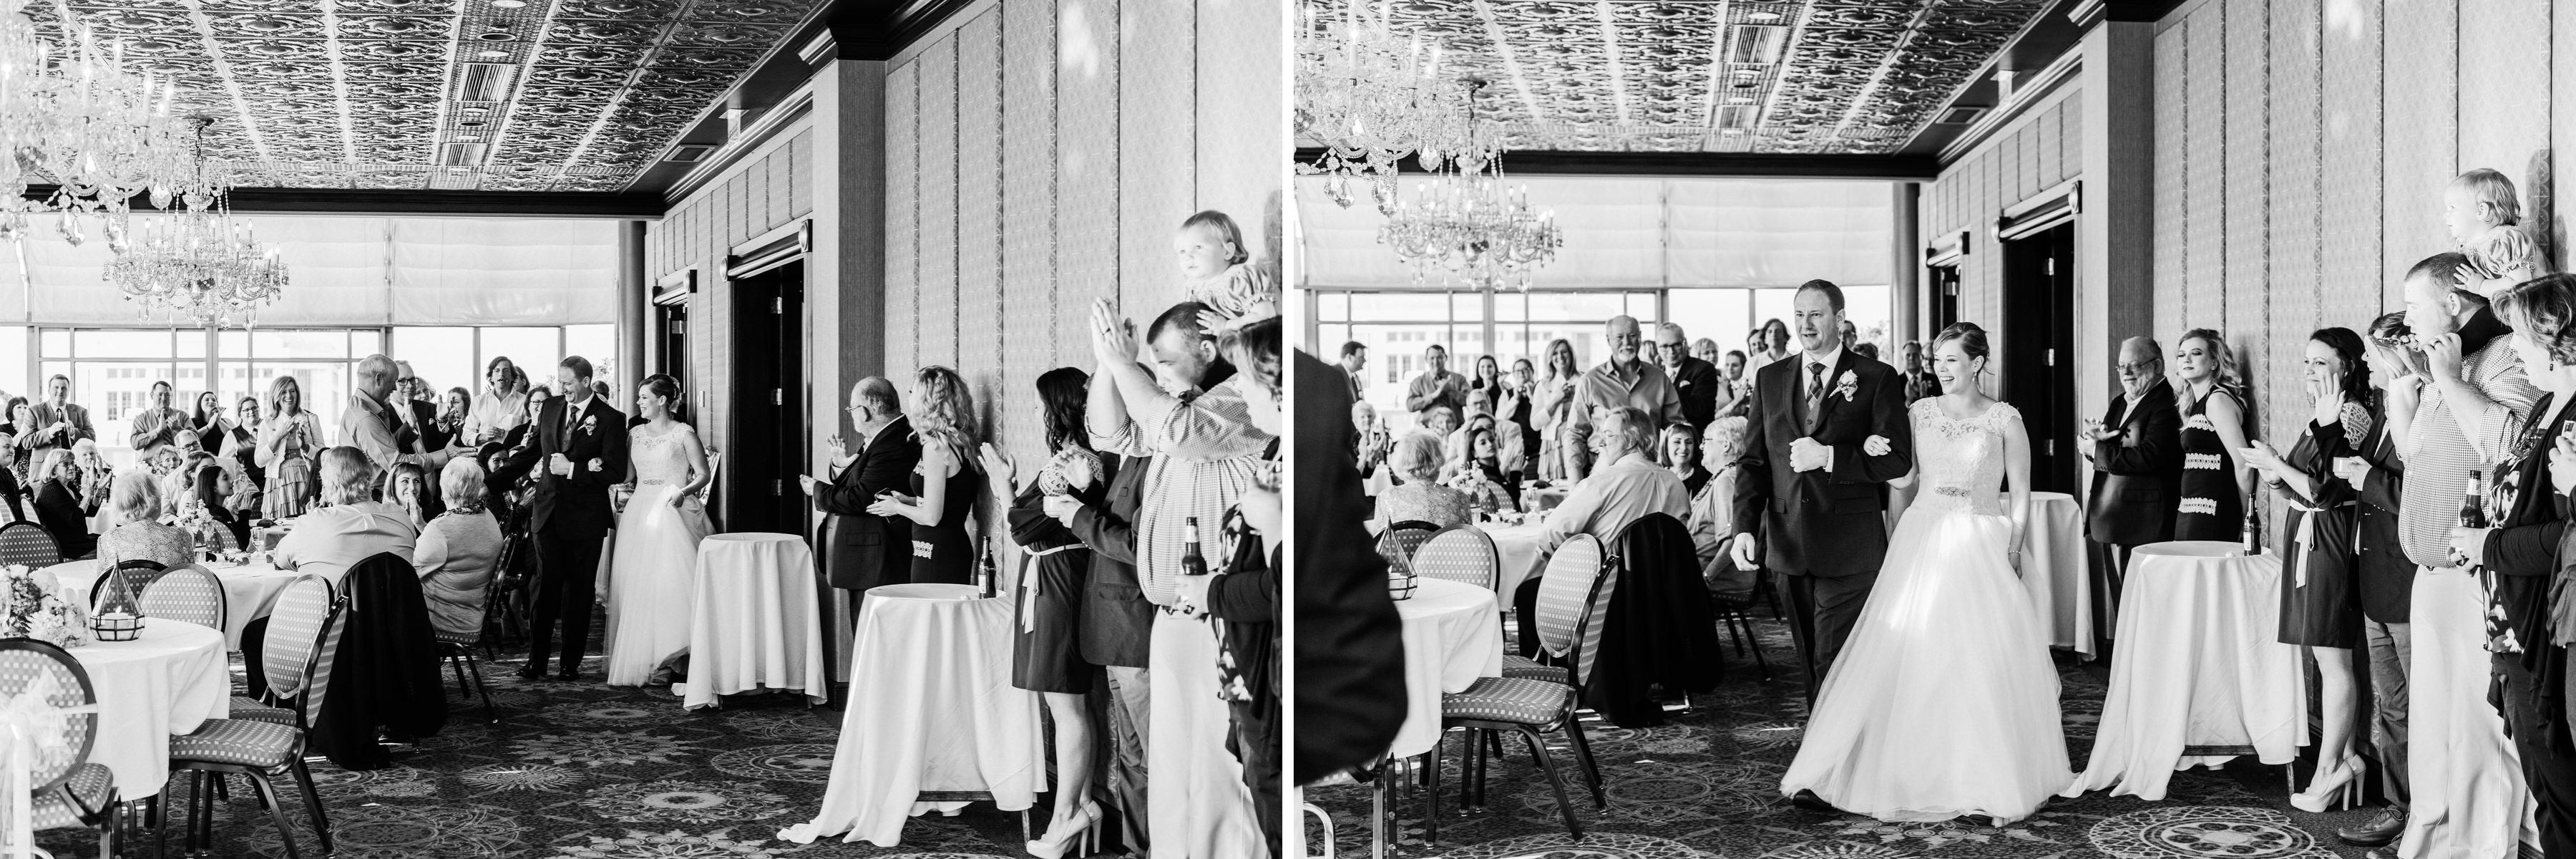 MAULDIN_WEDDING_MONTGOMERY_ALABAMA_WEDDING_PHOTOGRAPHY_95